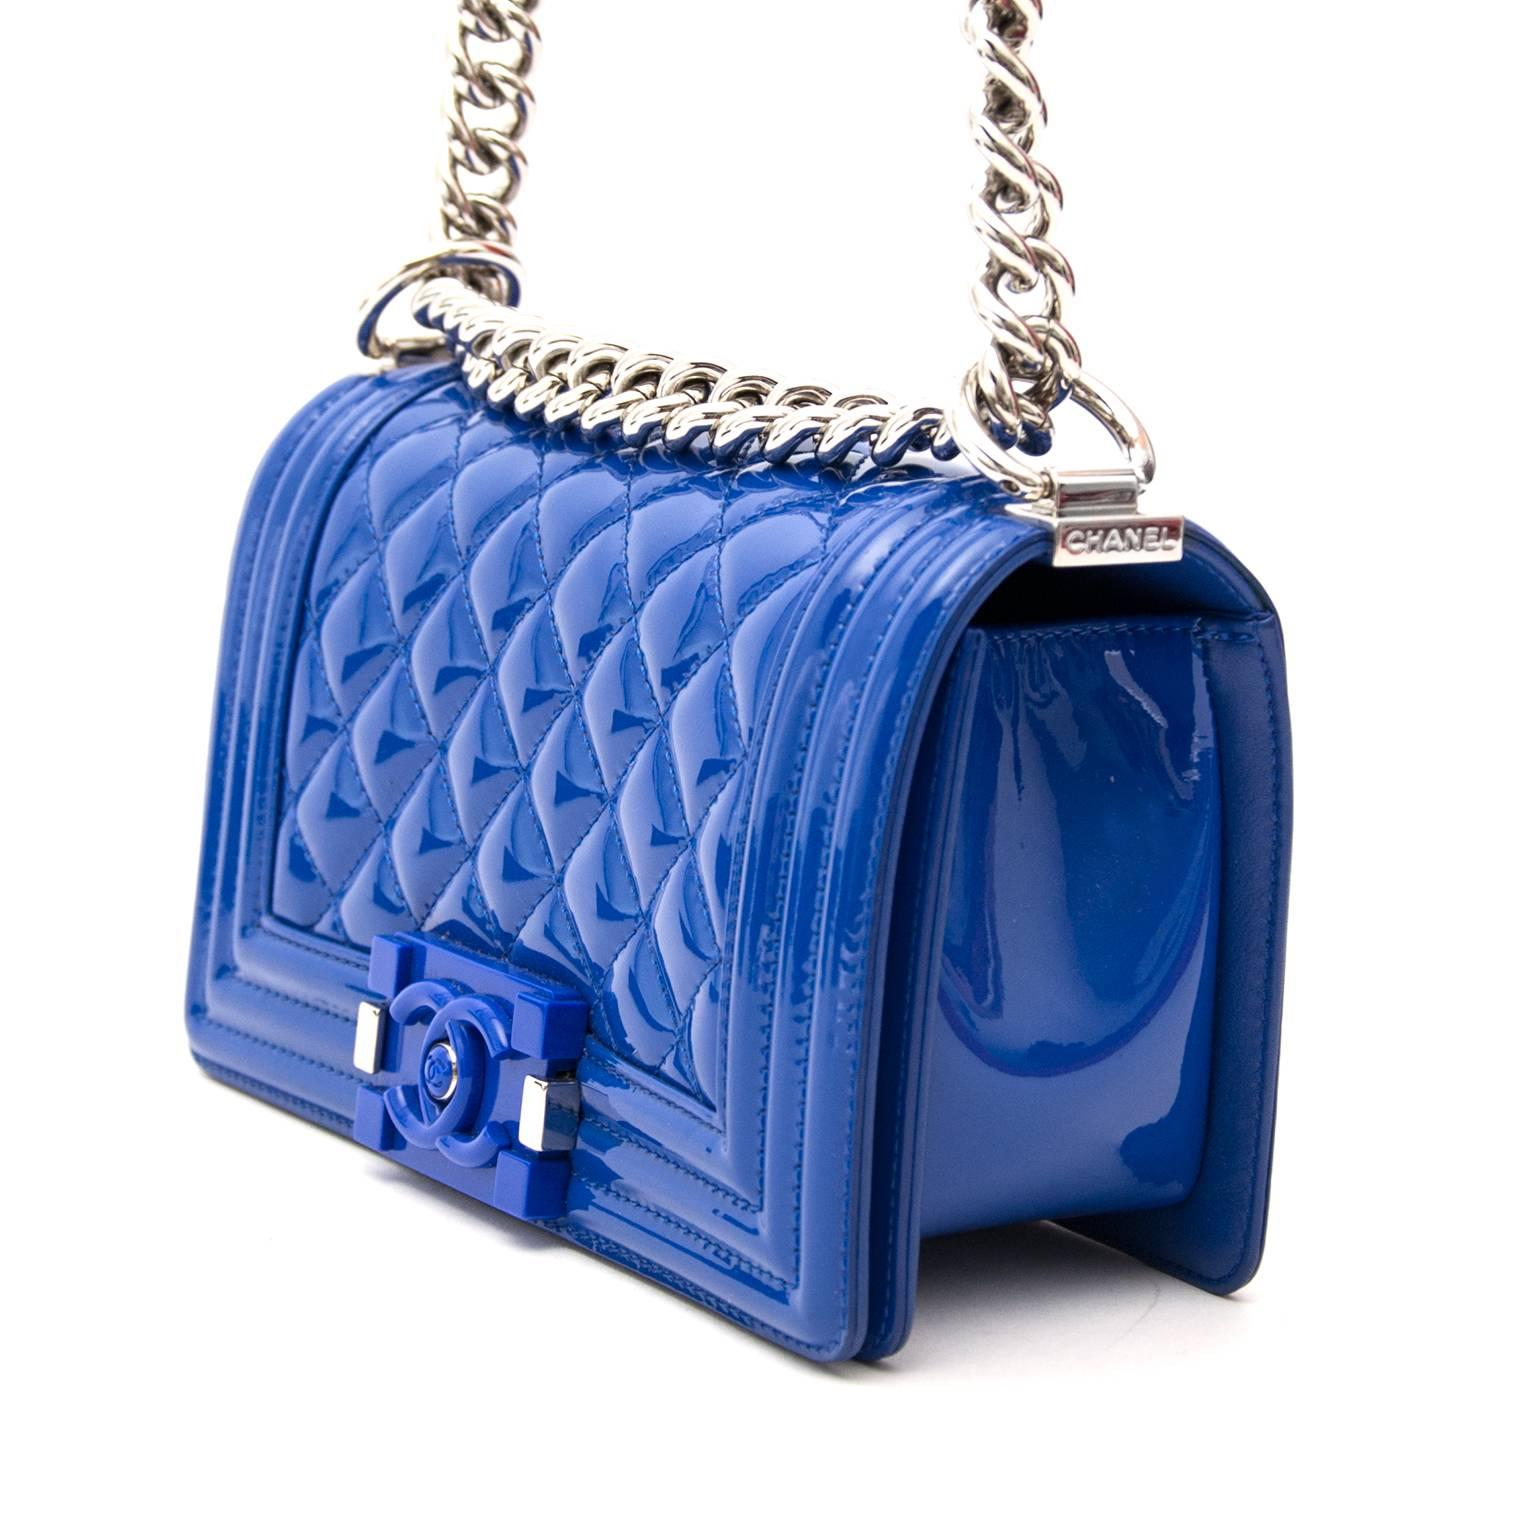 c6588ed69e185a Chanel Patent Petrol Blue Boy Bag with Plexiglass CC Boy Clasp at 1stdibs